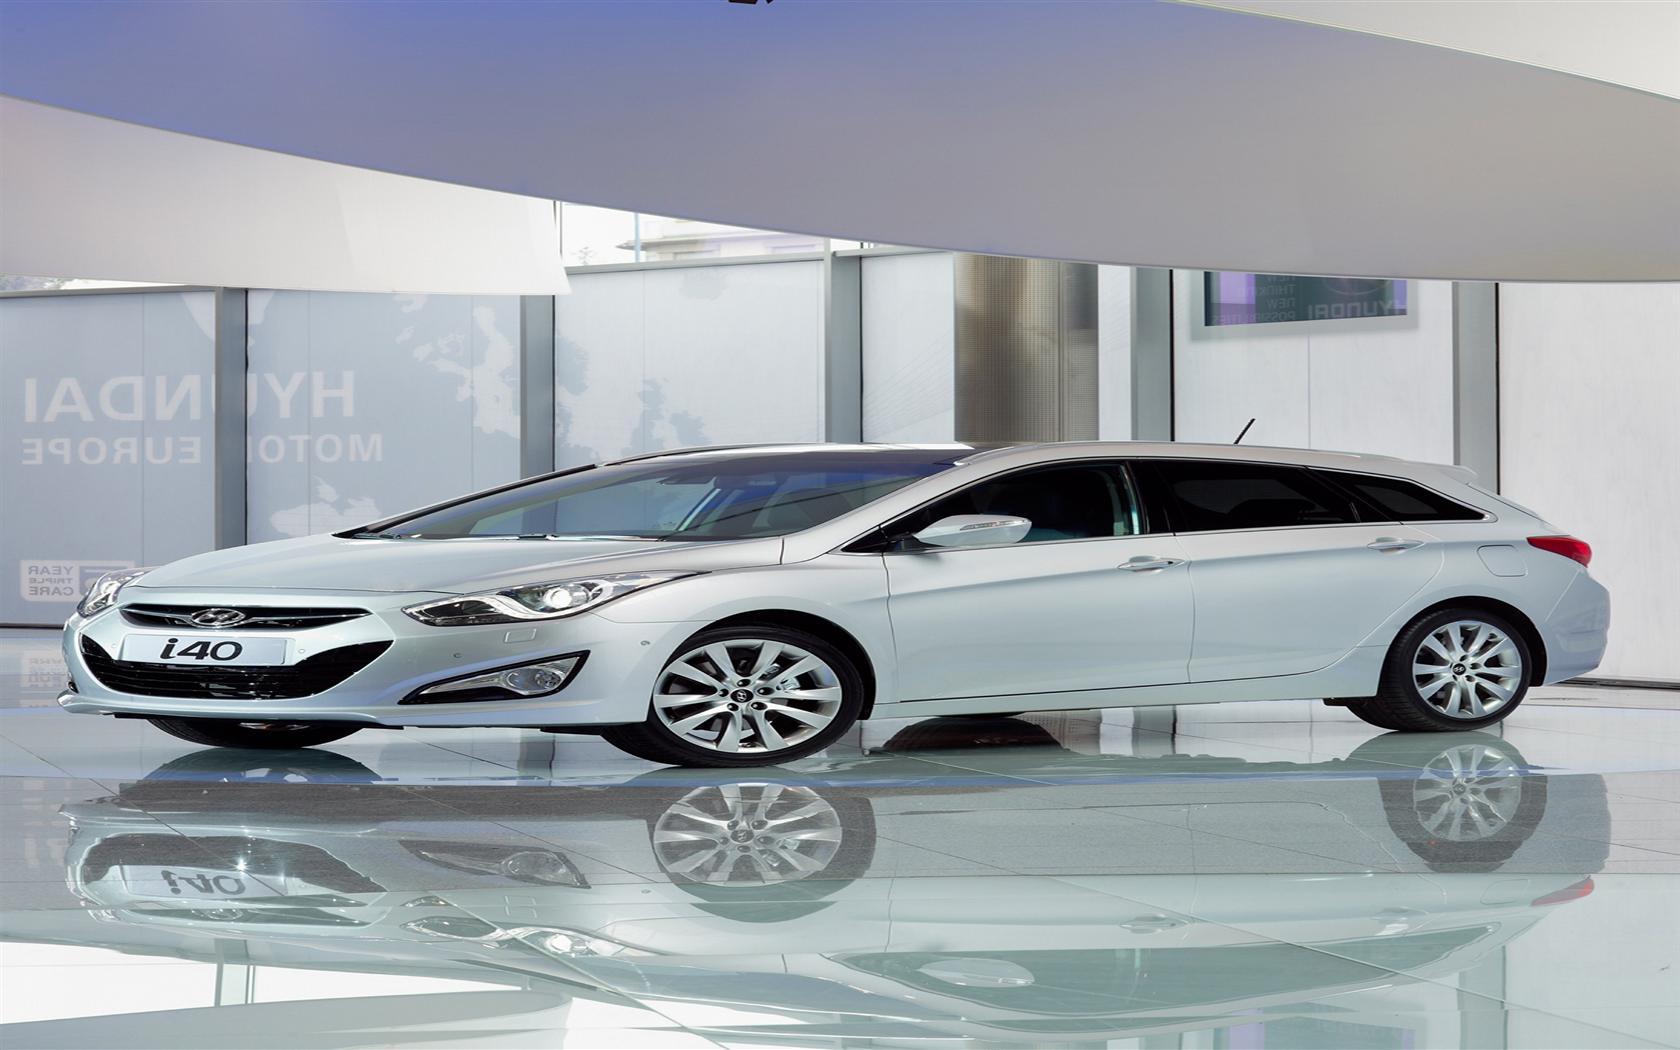 2011 Hyundai I40 Image